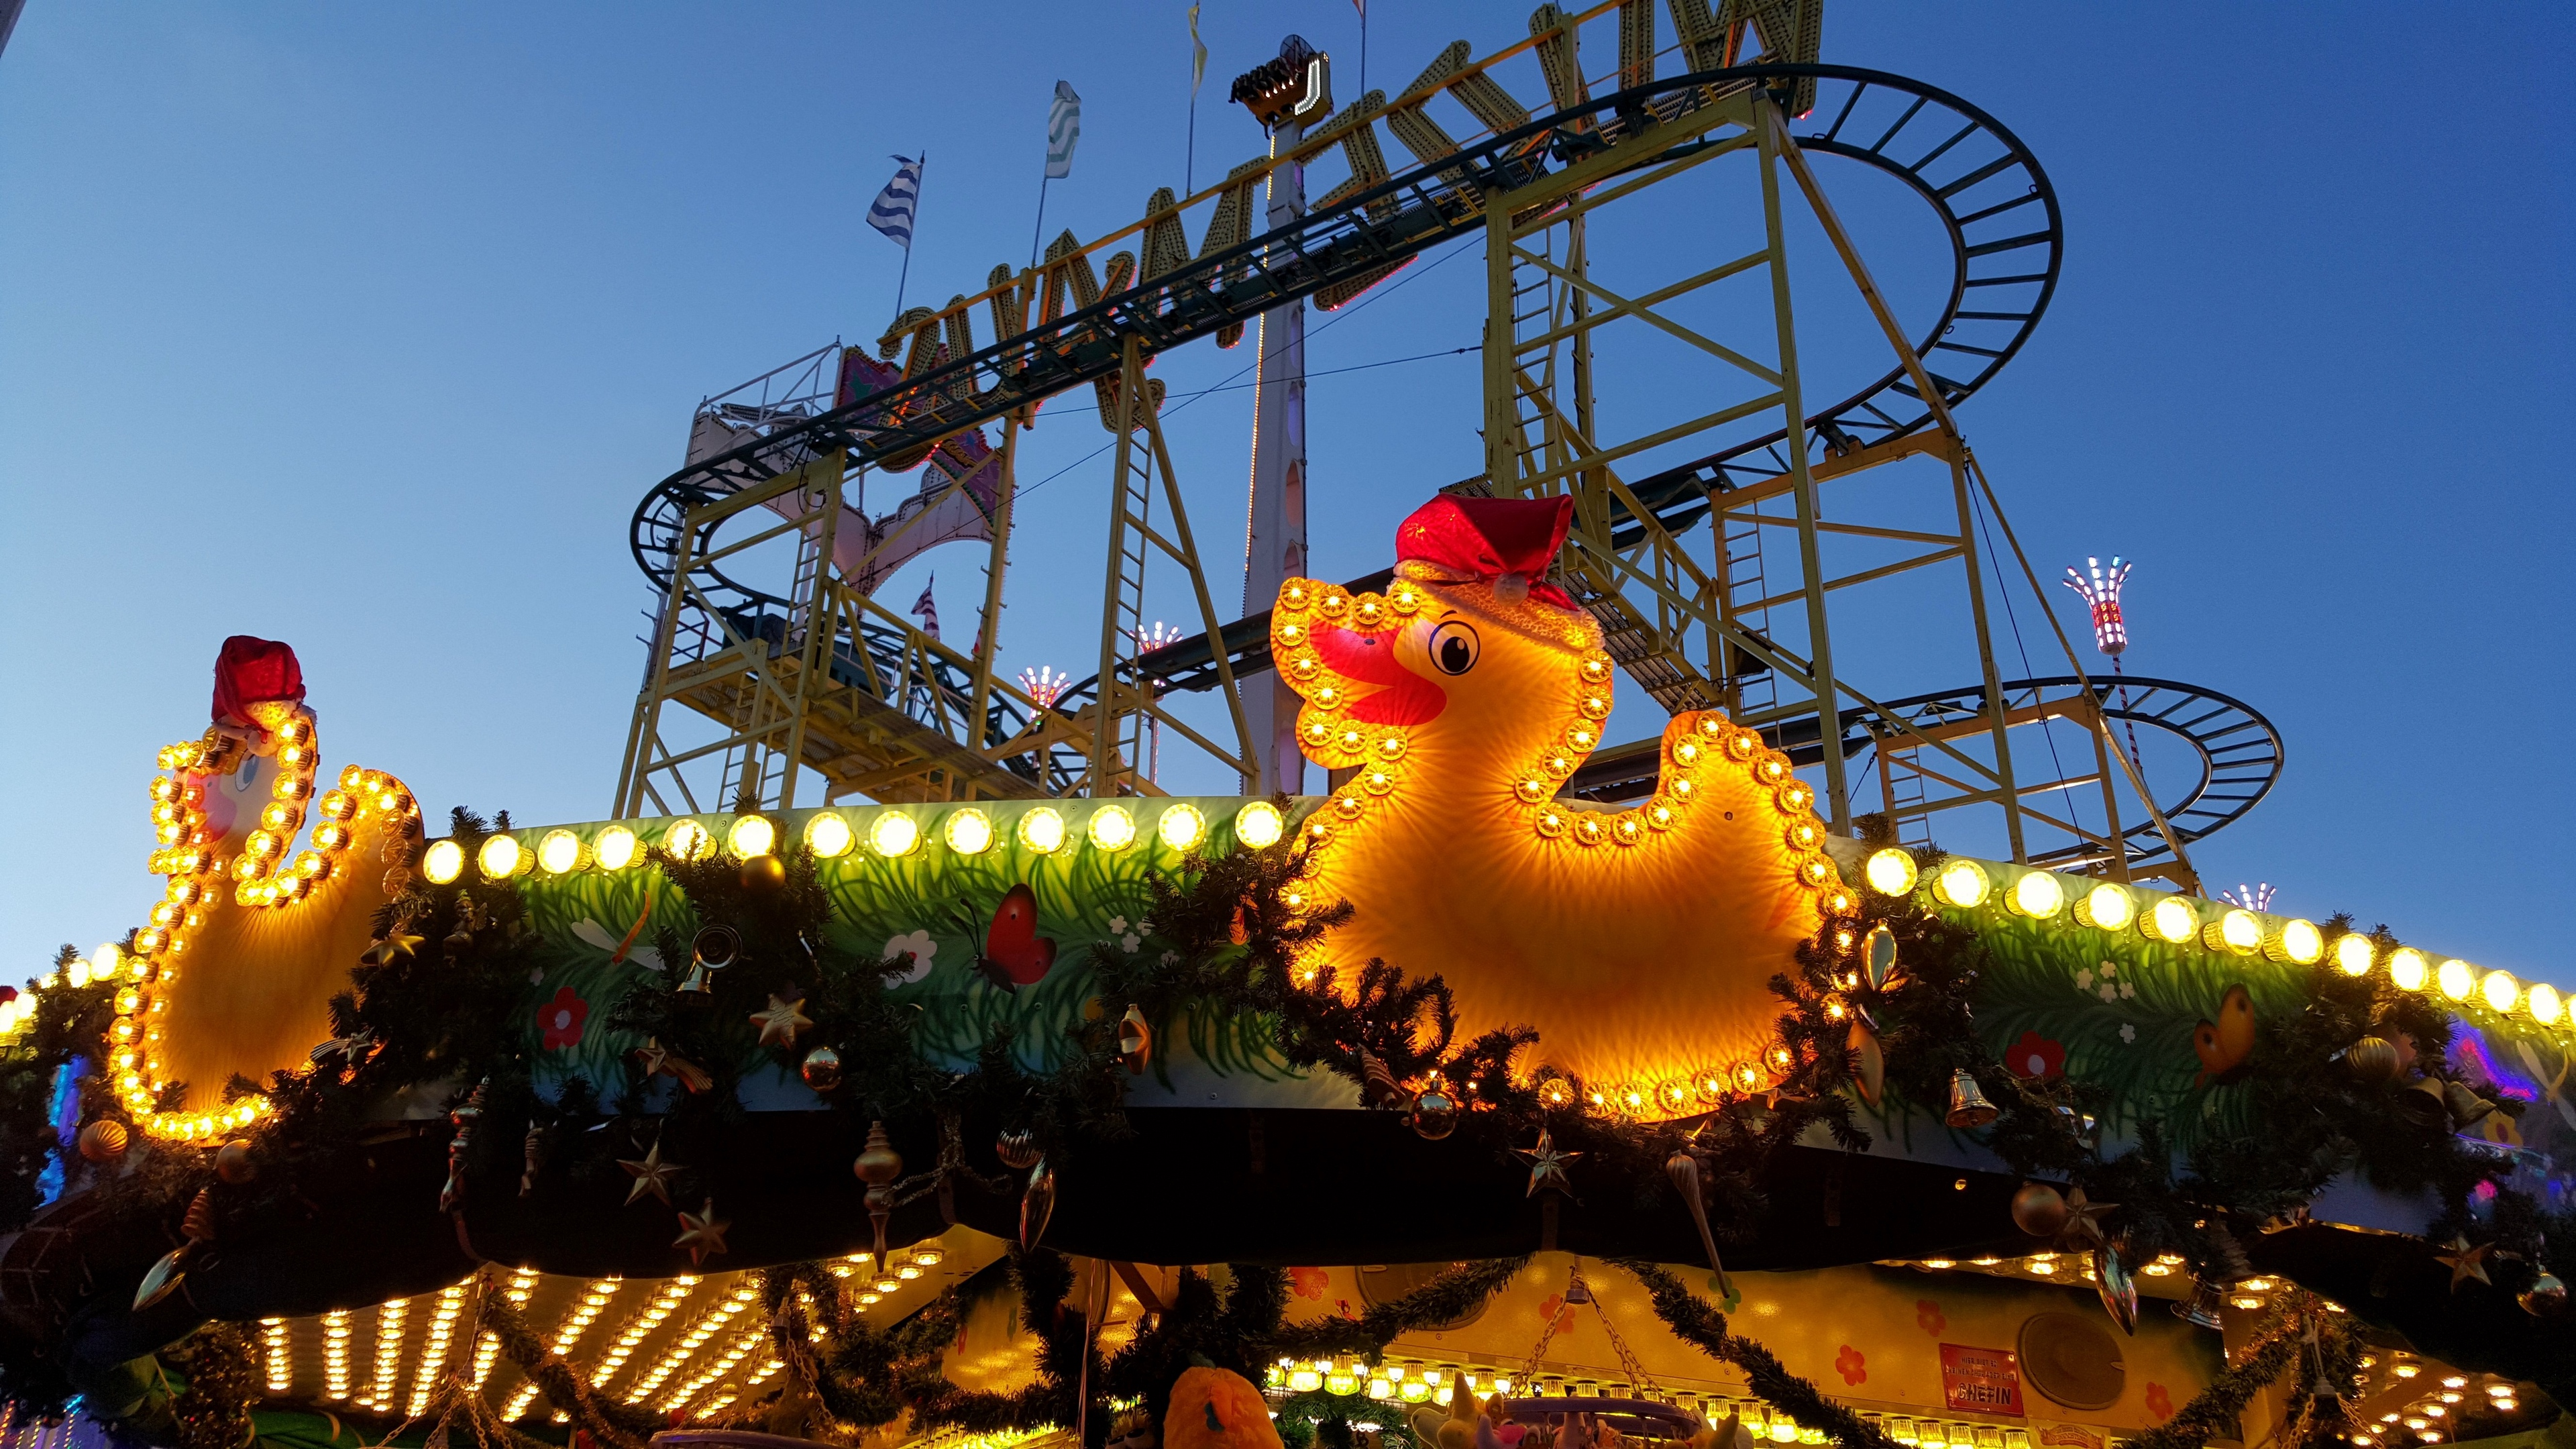 carousel berlin attraction ducks 4k 1538064839 - carousel, berlin, attraction, ducks 4k - carousel, Berlin, attraction